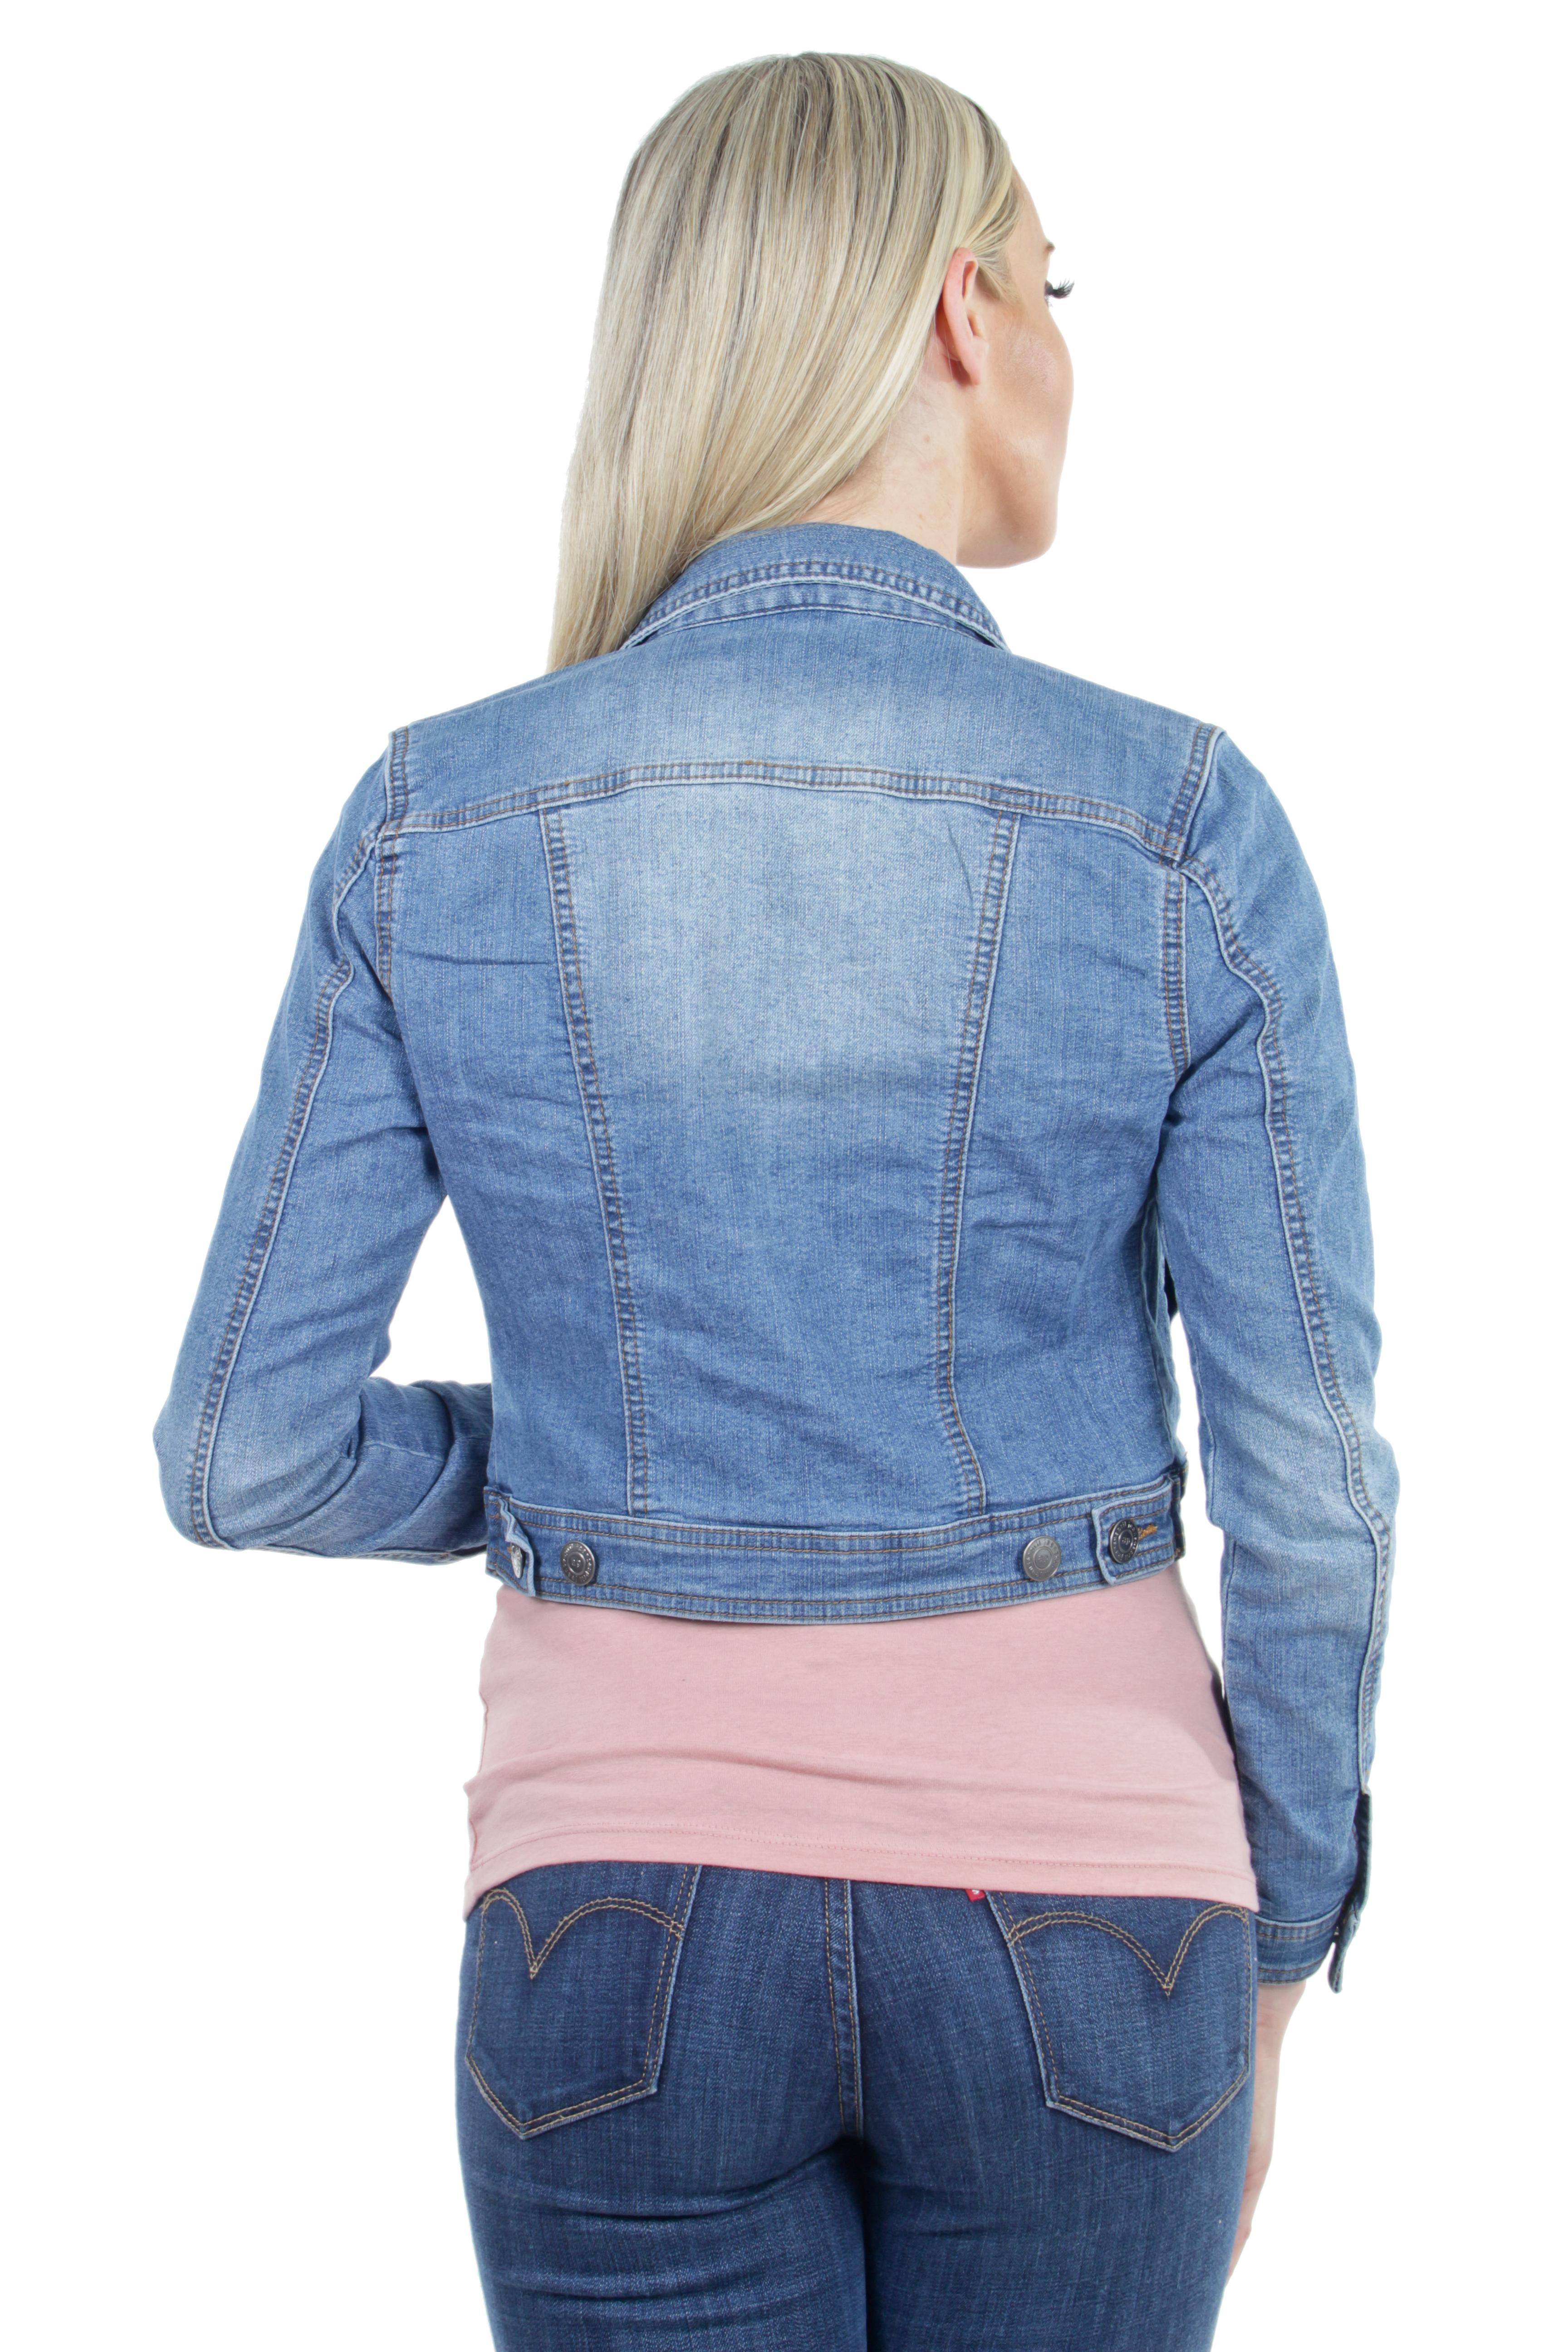 Women-039-s-Juniors-Premium-Stretch-Denim-Long-Sleeve-Jacket thumbnail 13